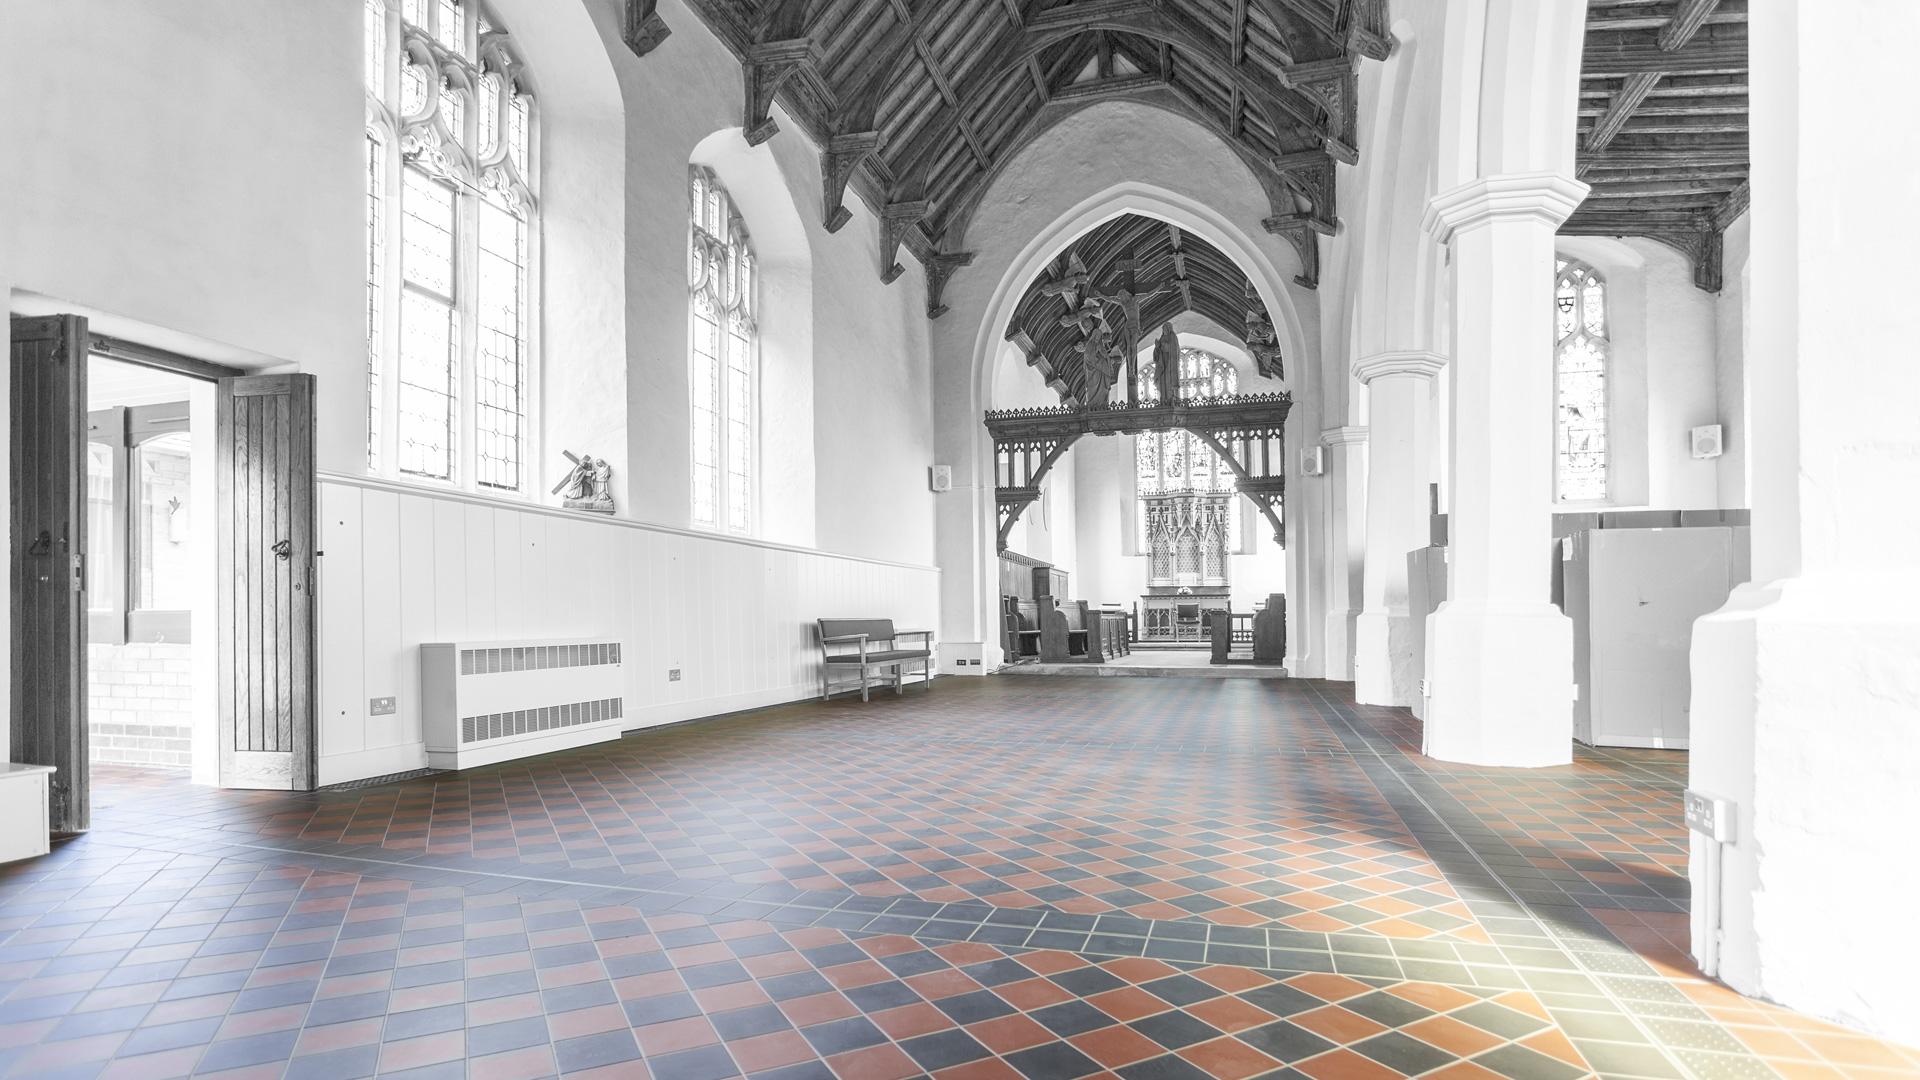 st-marys-church-2